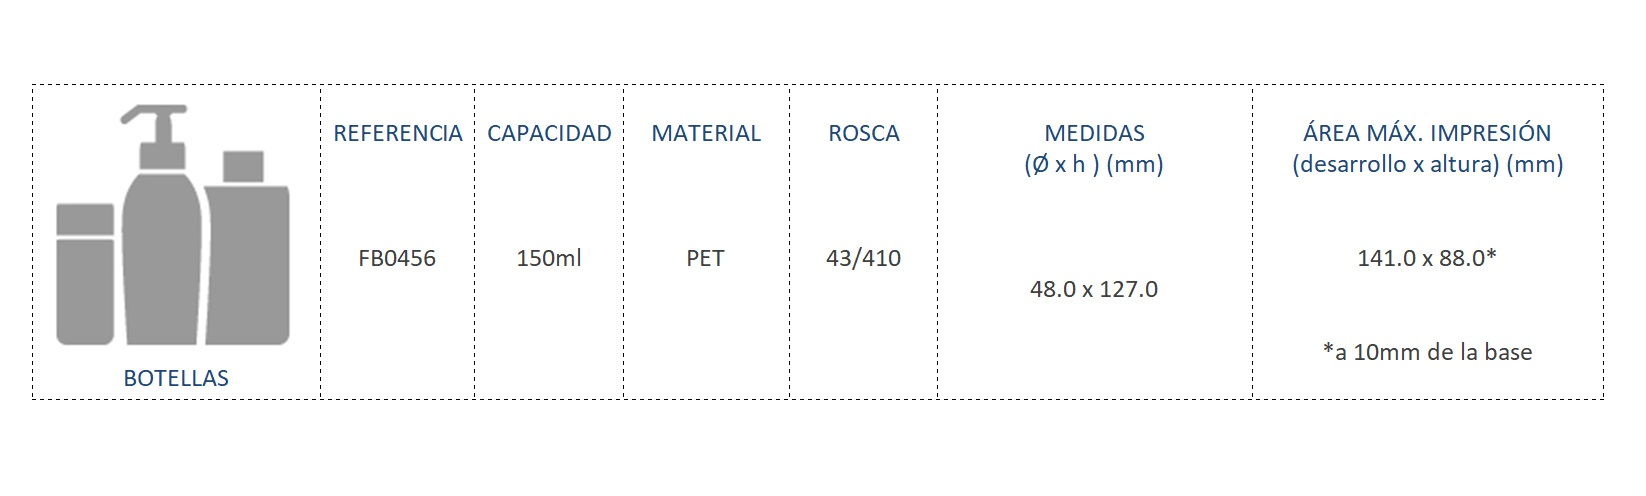 Cuadro de materiales FB0456